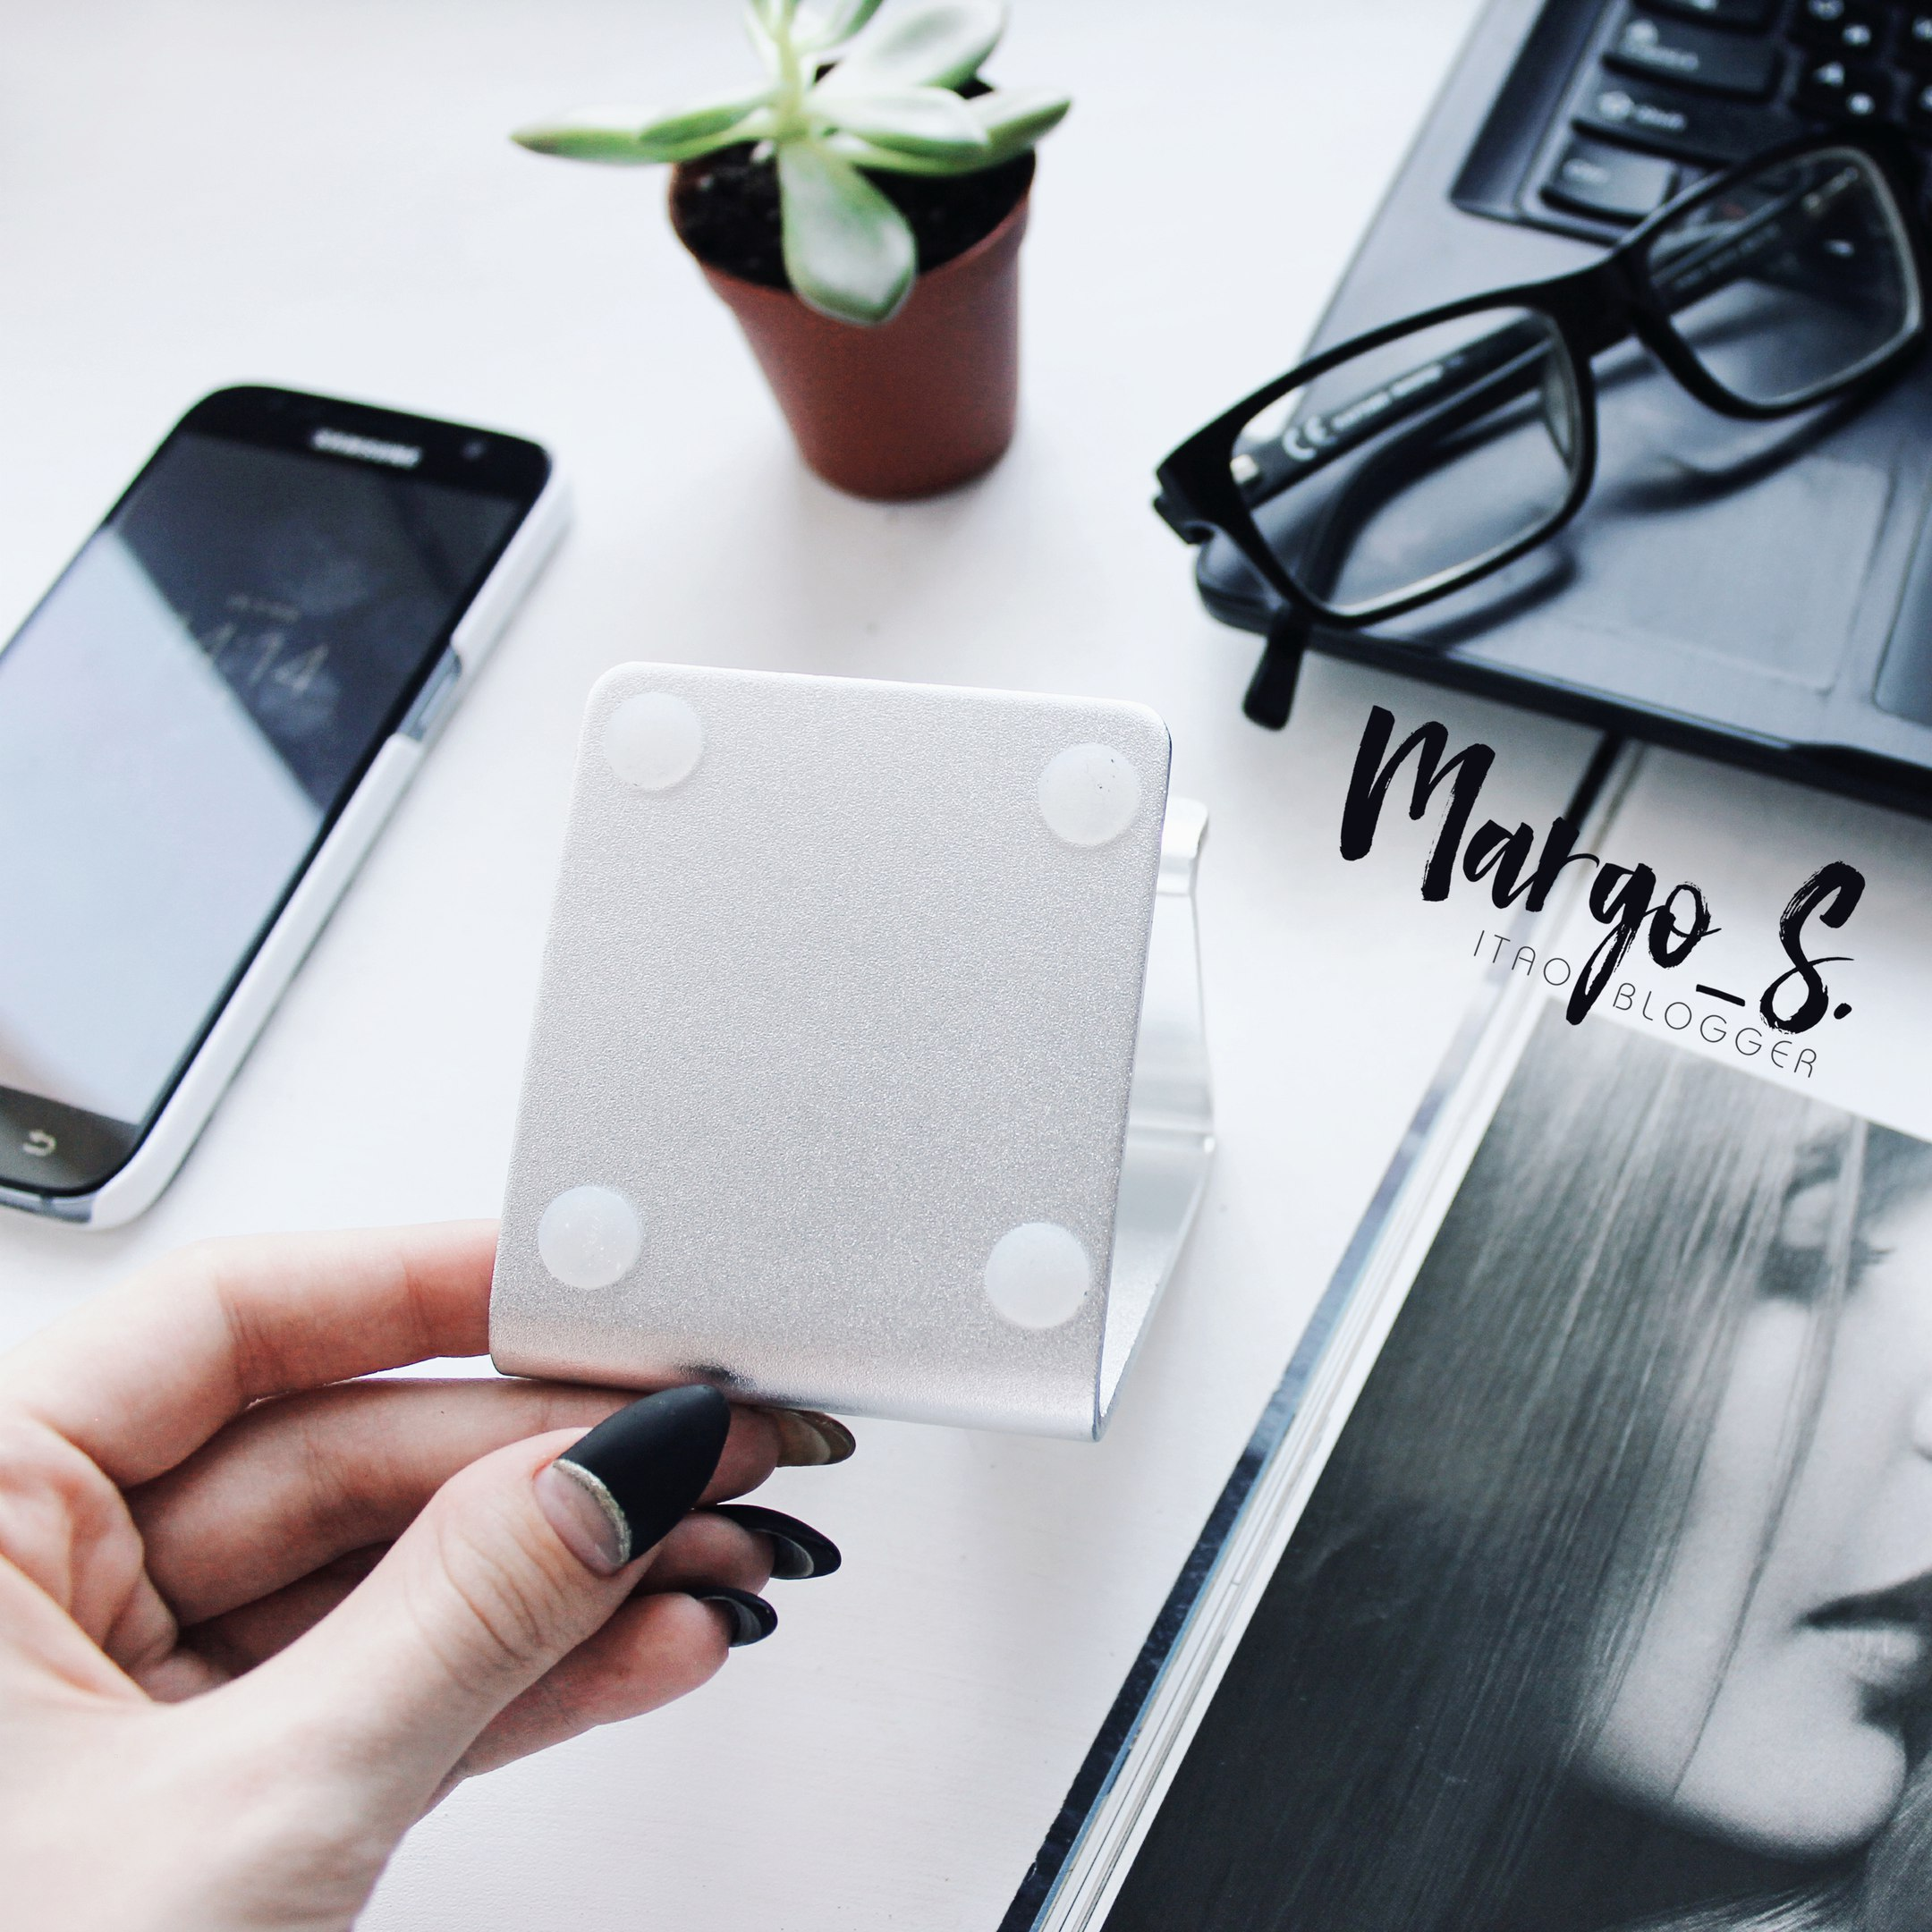 Серебристая подставка под телефон или планшет за 260 руб из RAXFLY Official Store